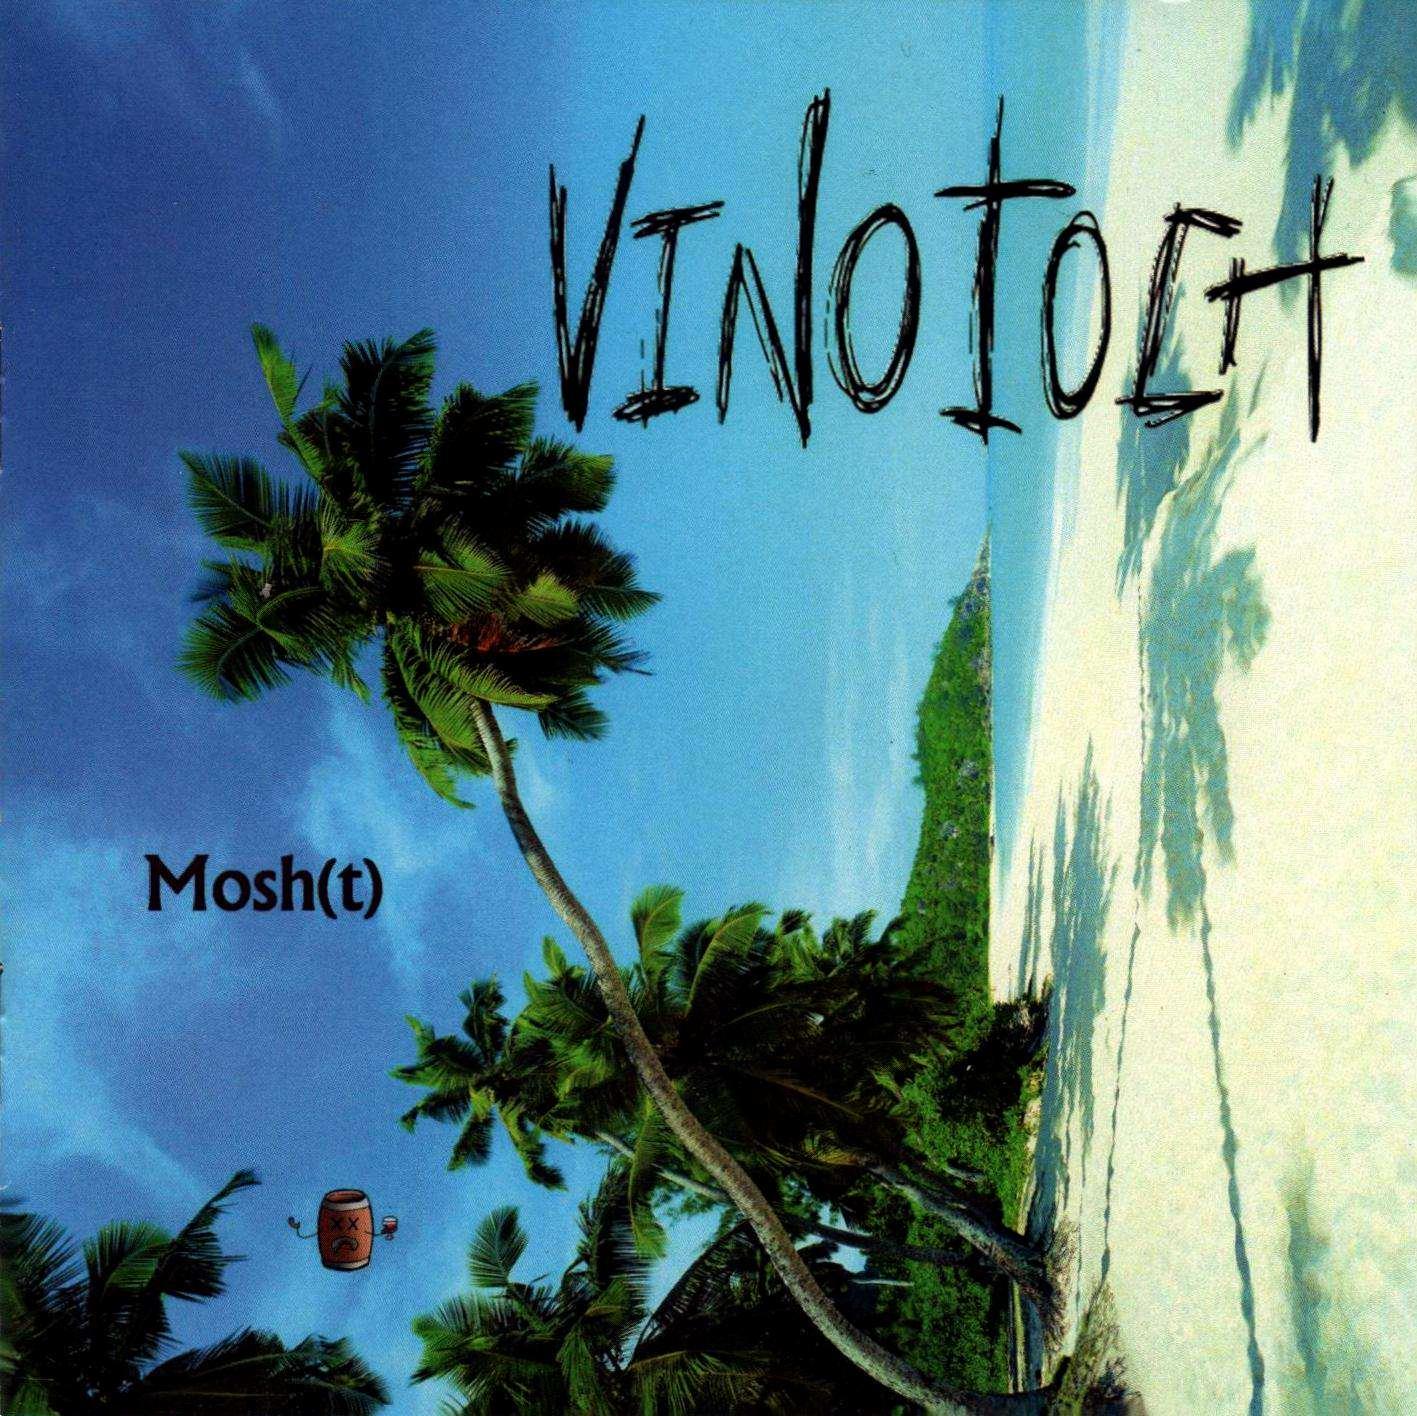 Vinotoch – Mosh(t)